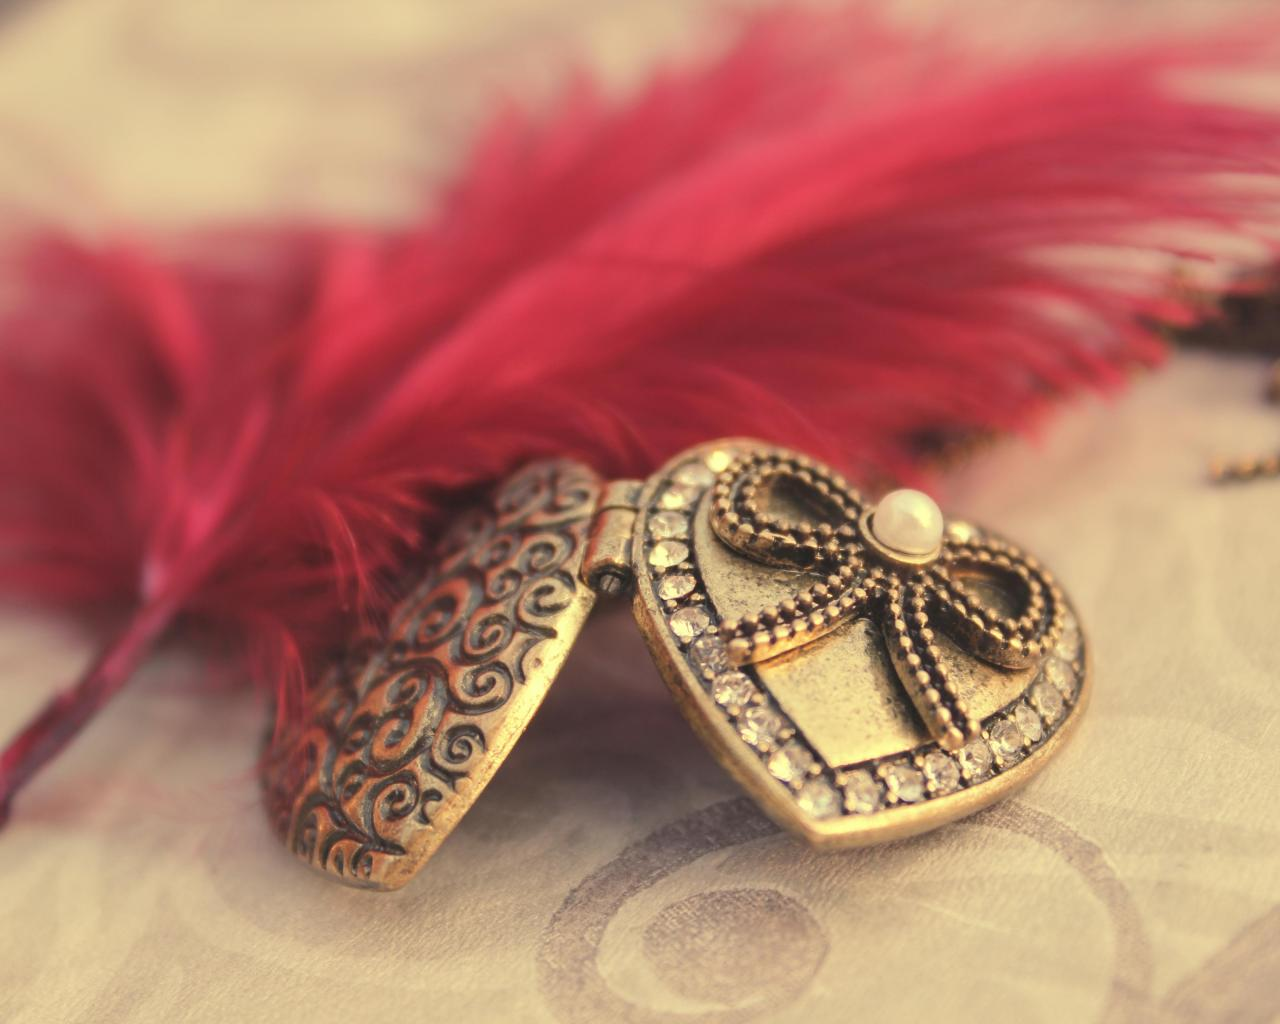 Wallpaper Tags: friendship feather beautiful jewelry locket heart romance photography love hearts bow pendant